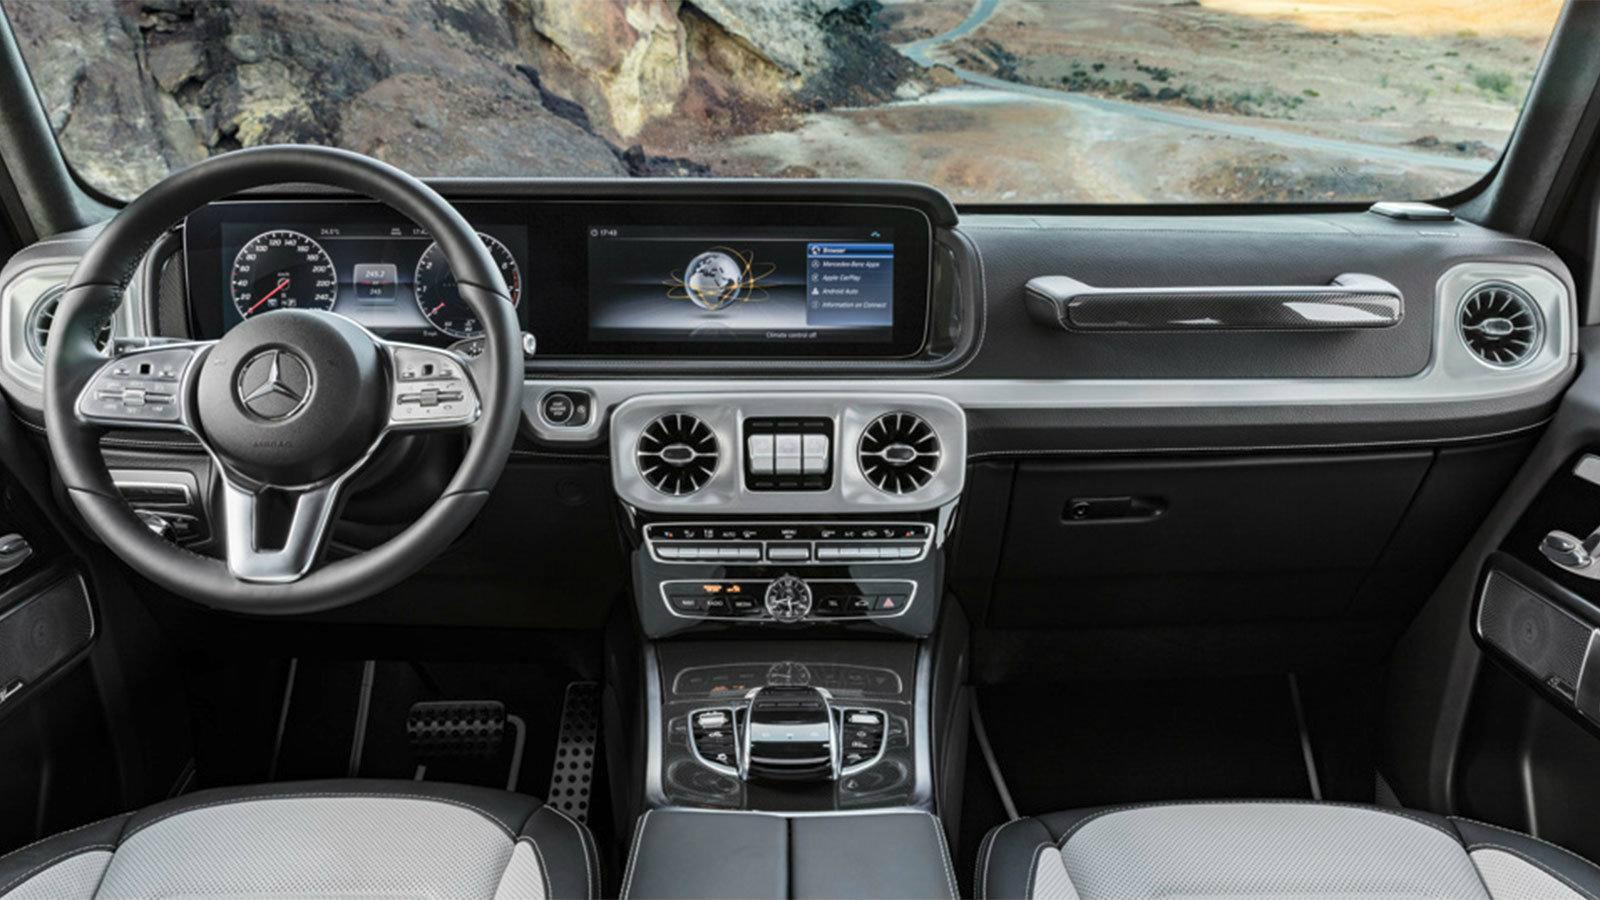 Tο γερμανικό SUV θα προσφέρεται με τον twin-turbo 4.0 λίτρων V8 κινητήρα d98d9ae2e64